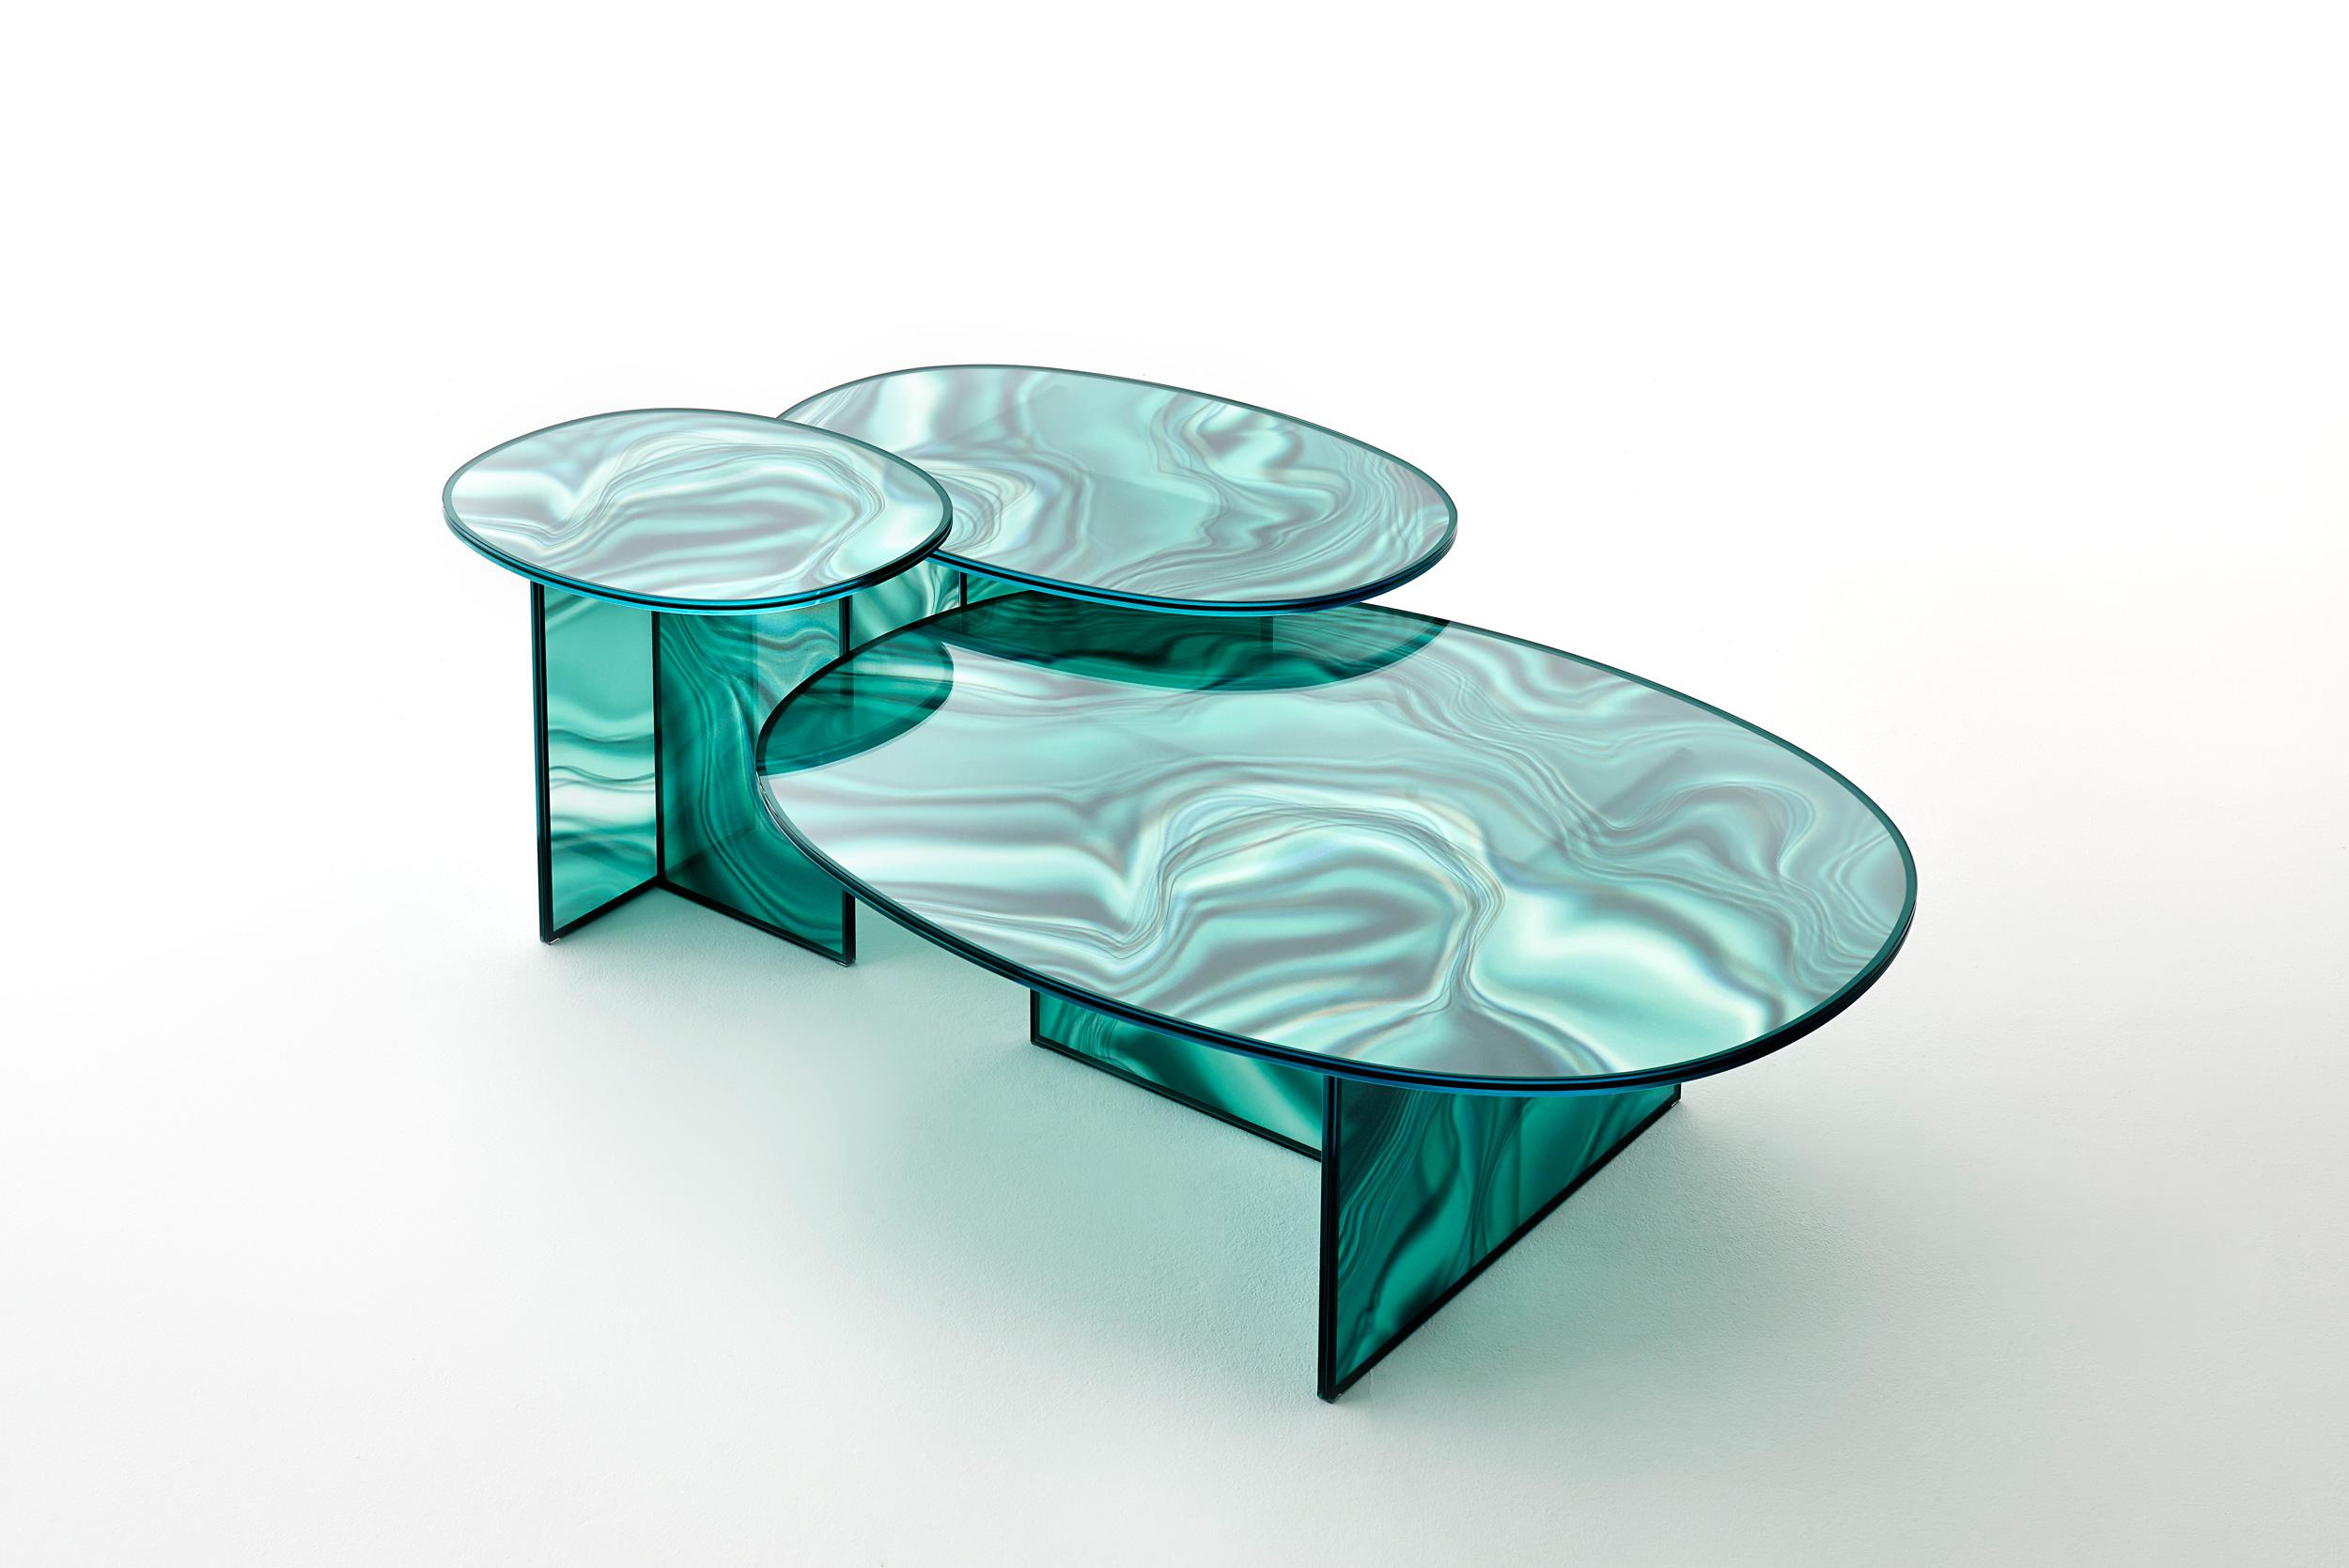 Liquefy by Patricia Urquiola for Glass Italia at Salone del Mobile 2017   Yellowtrace